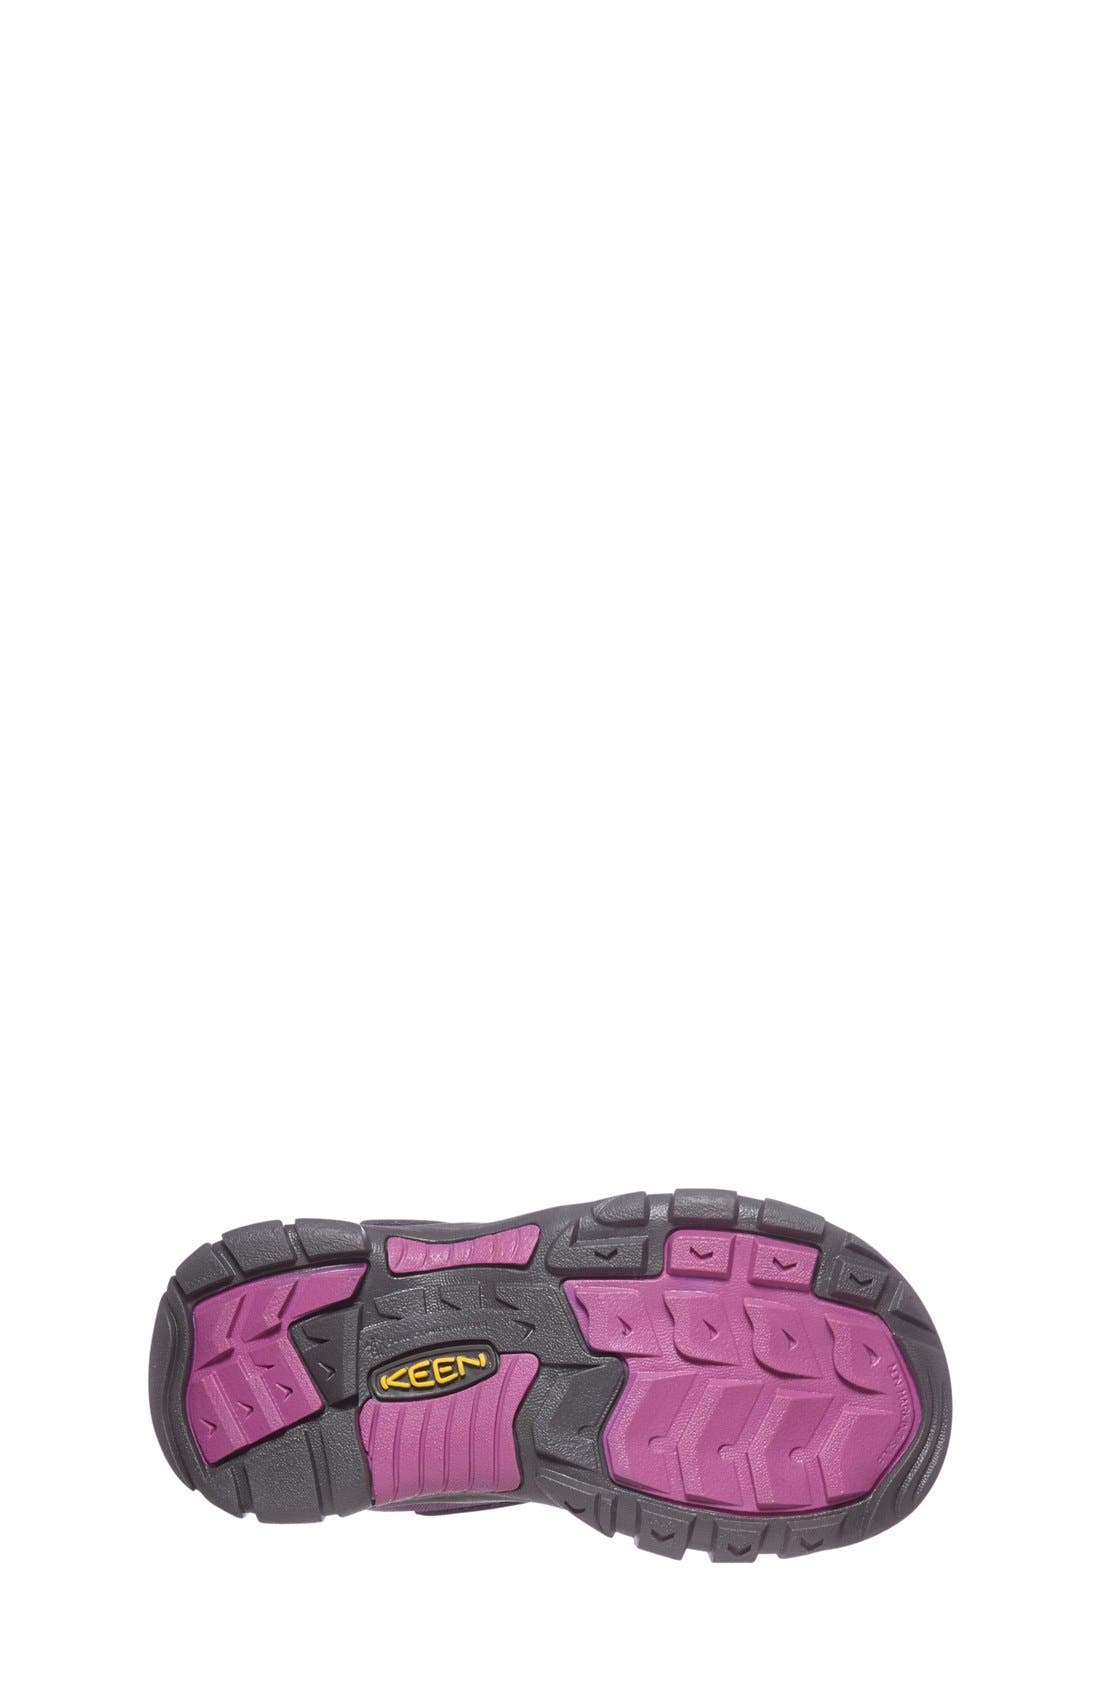 'Kootenay' Waterproof Winter Boot,                             Alternate thumbnail 4, color,                             Wineberry/ Dahlia Mauve